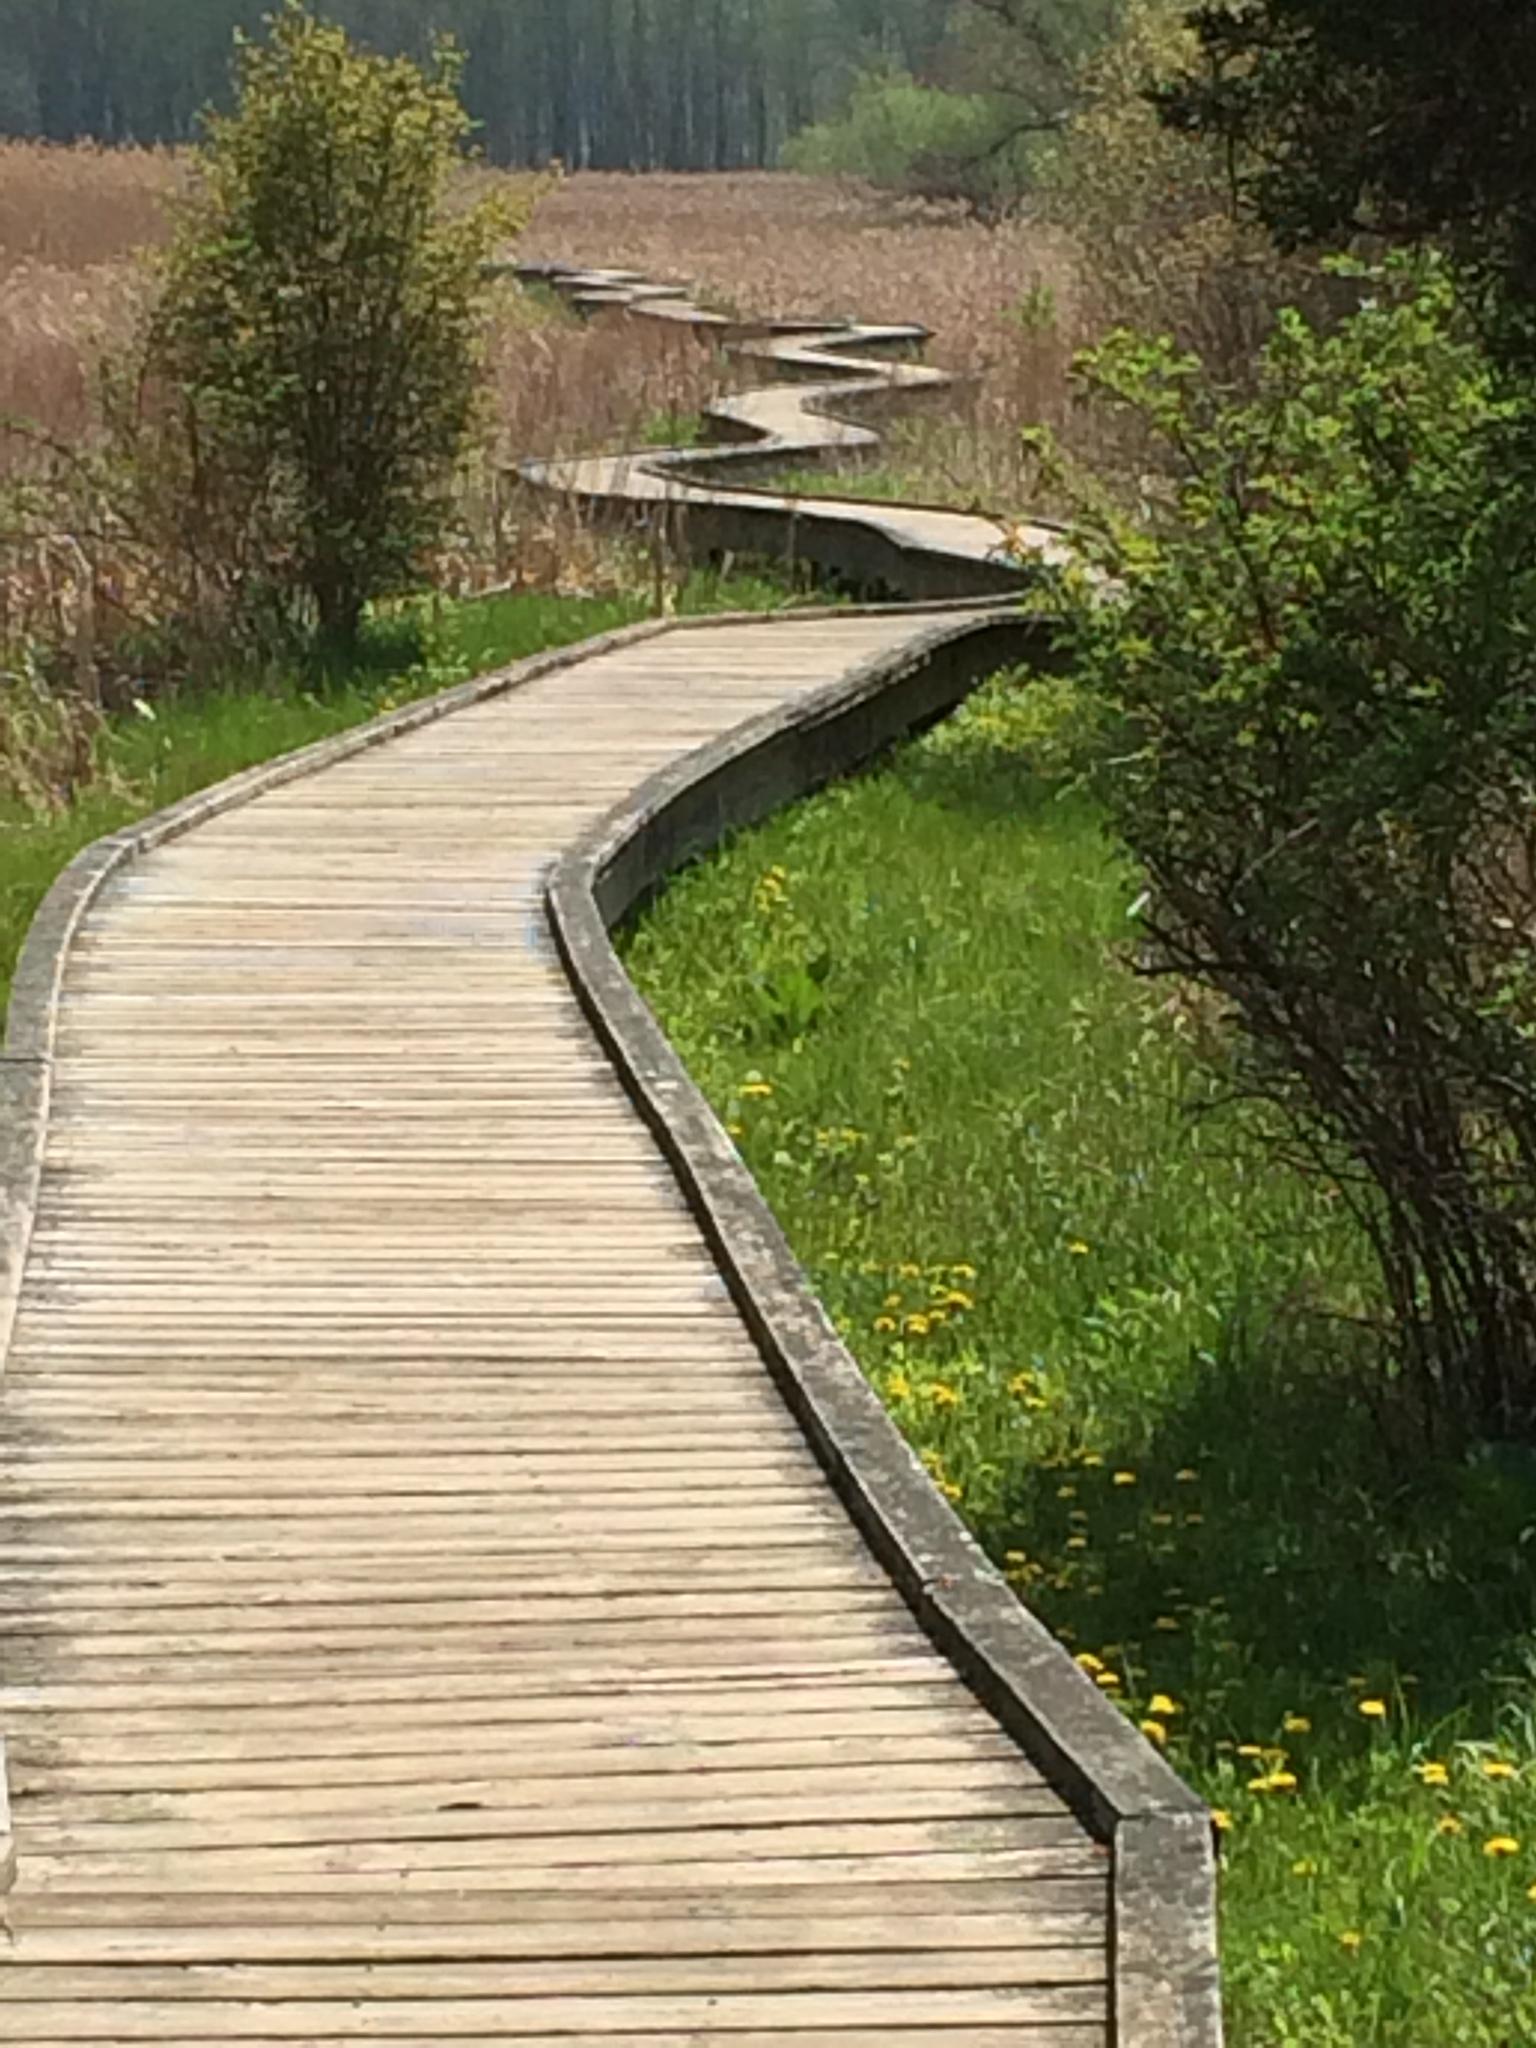 Pochuck Valley boardwalk, part of Appalachian Trail, in Vernon.